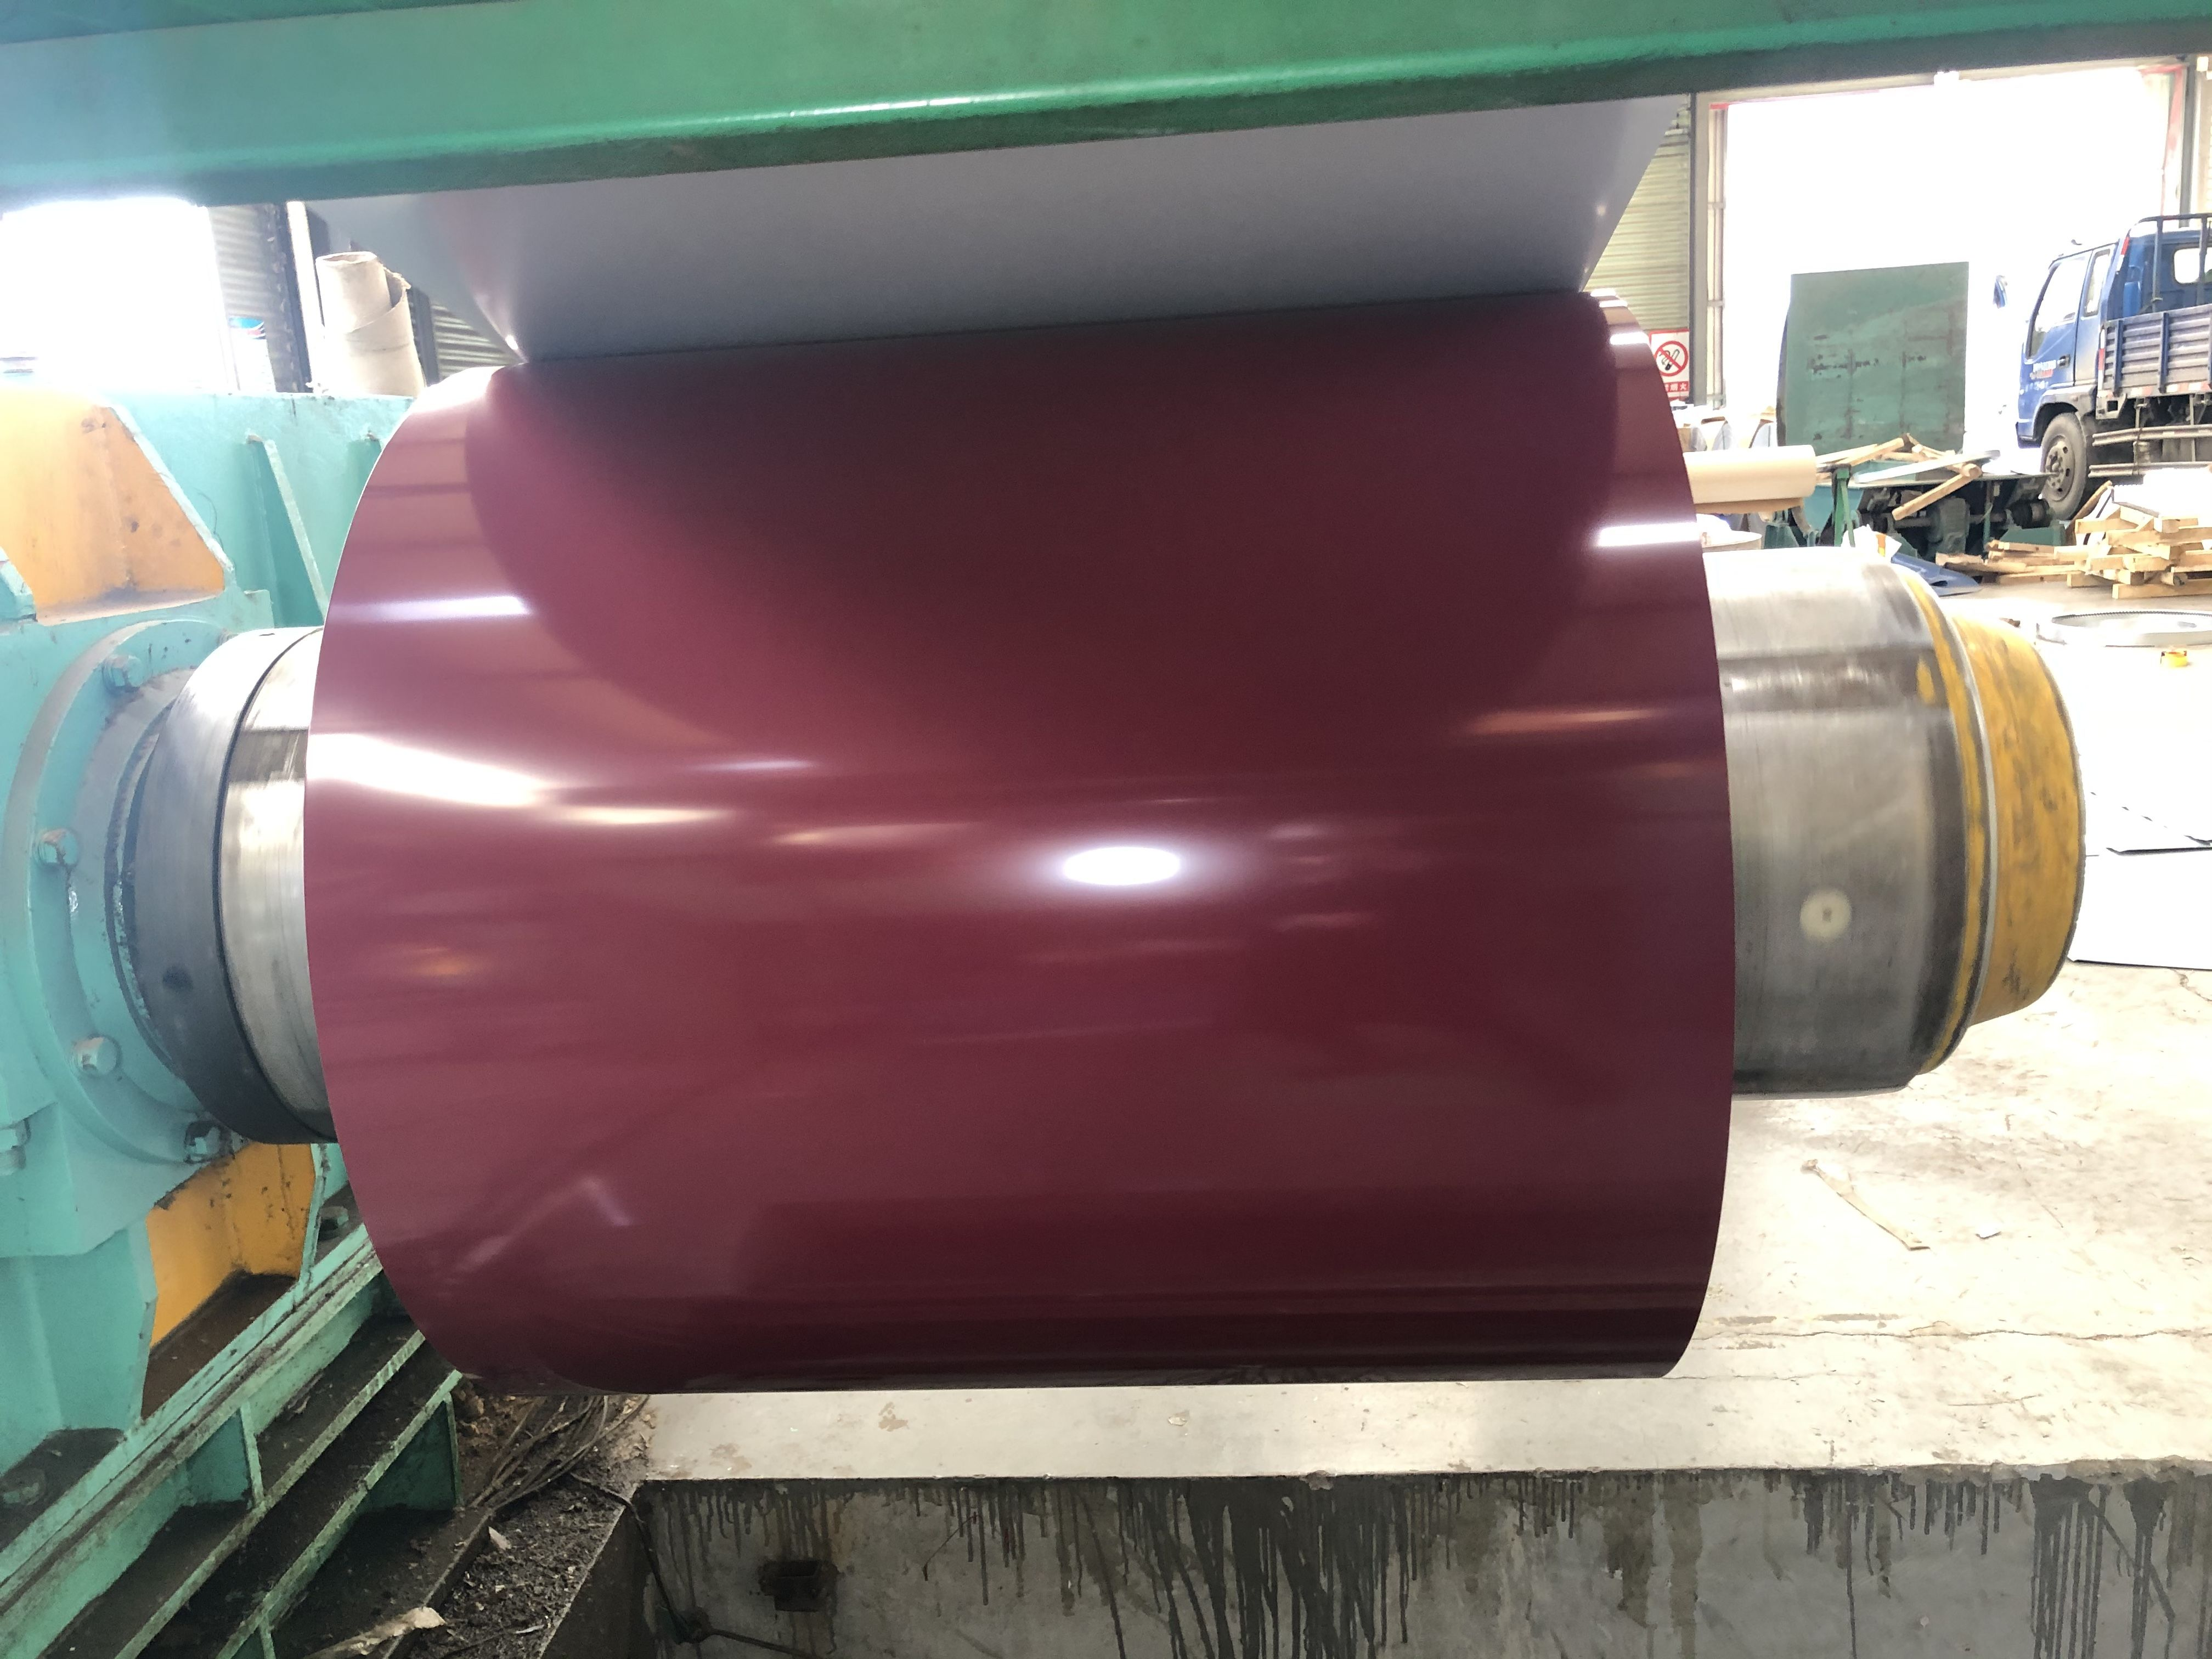 Ral3005 Prepainted Aluminum Coil Wechate Whatsapp 8615254382836 Loveucandice Hotmail Com Aluminum Color Coil